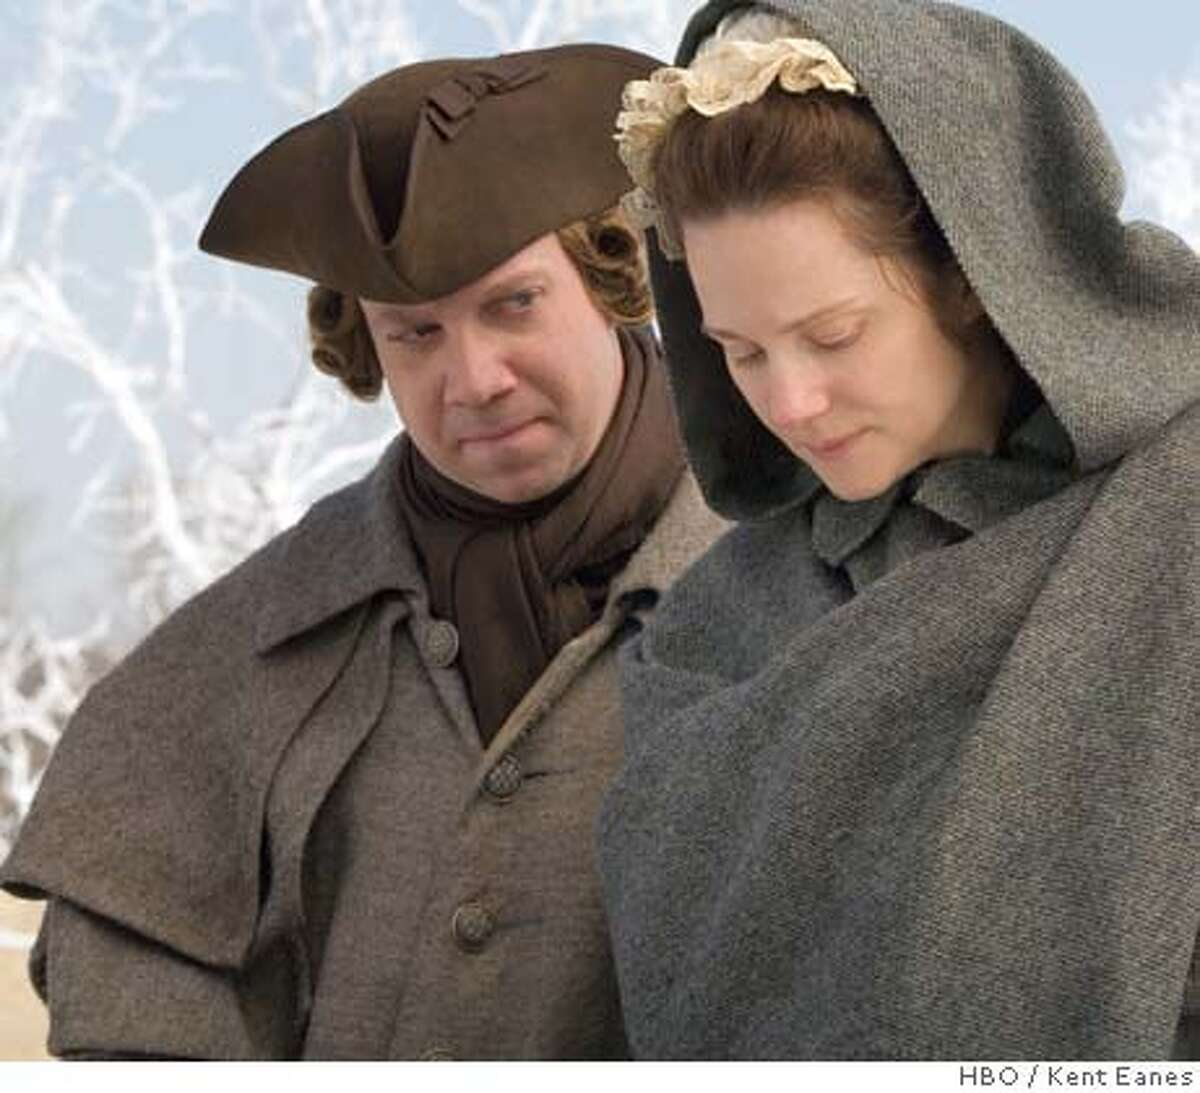 Paul Giamatti as John Adams, and Laura Linney as Mrs. John Adams in HBO's